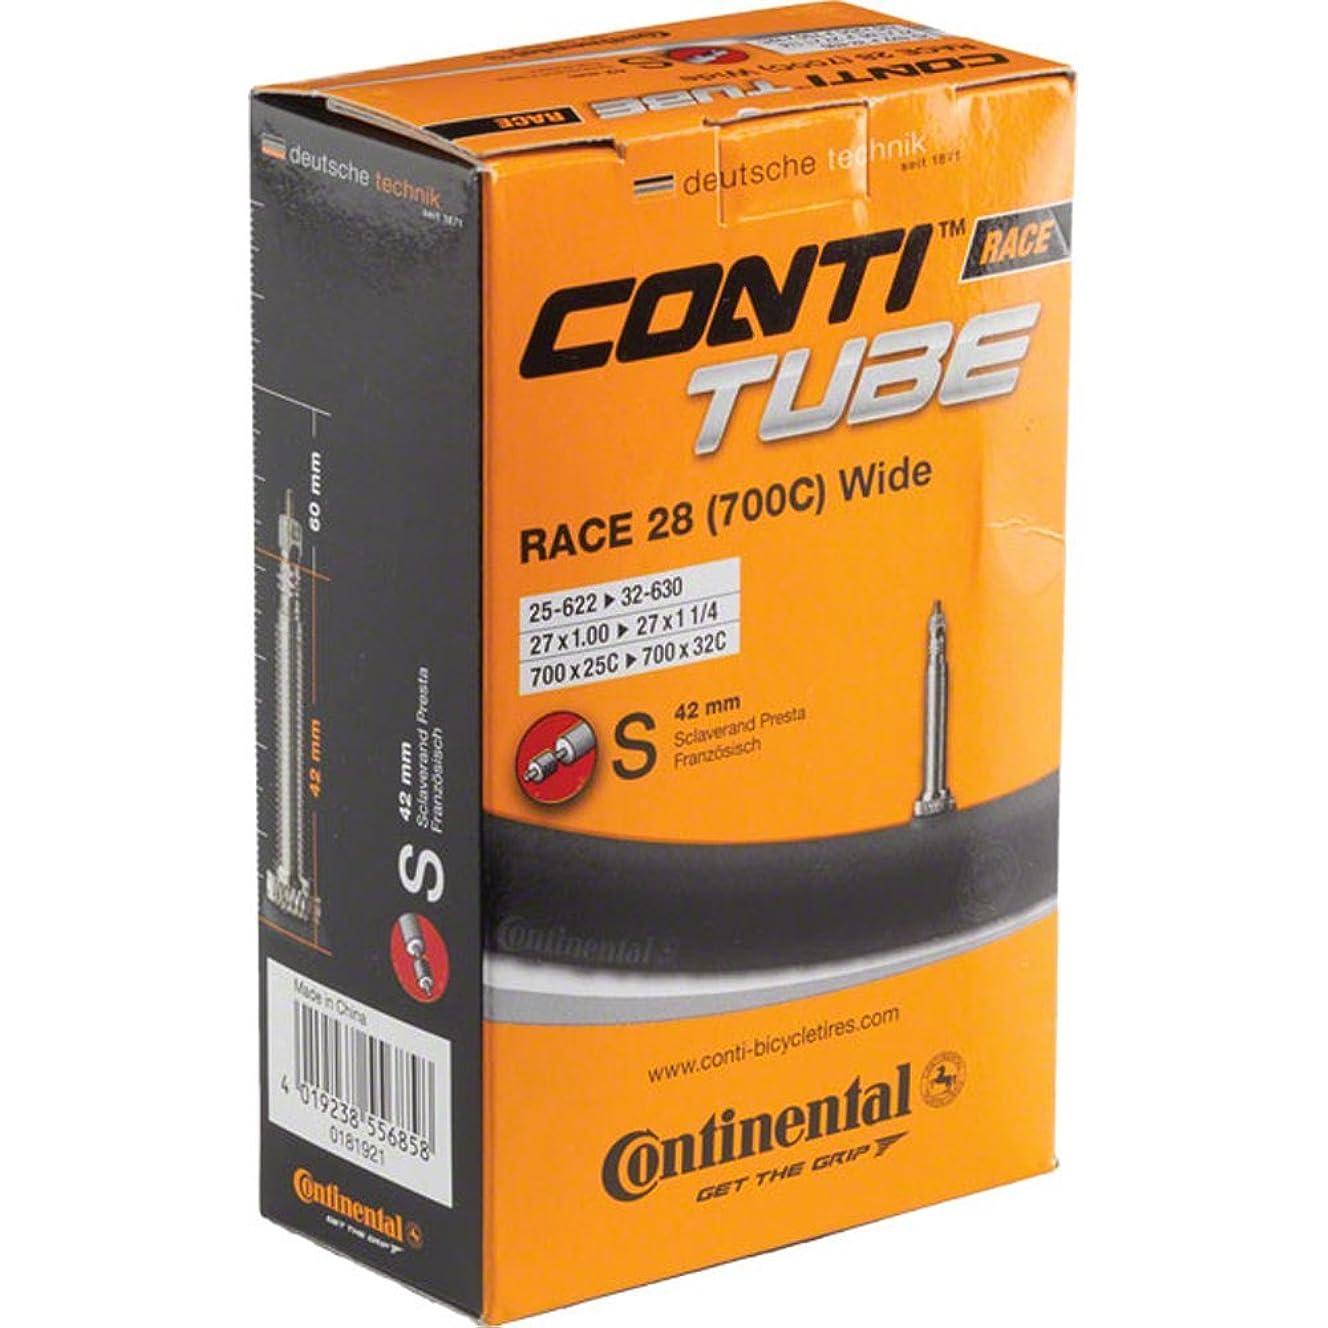 Continental 42mm Presta Valve Tube, Black, 700 x 25-32cc